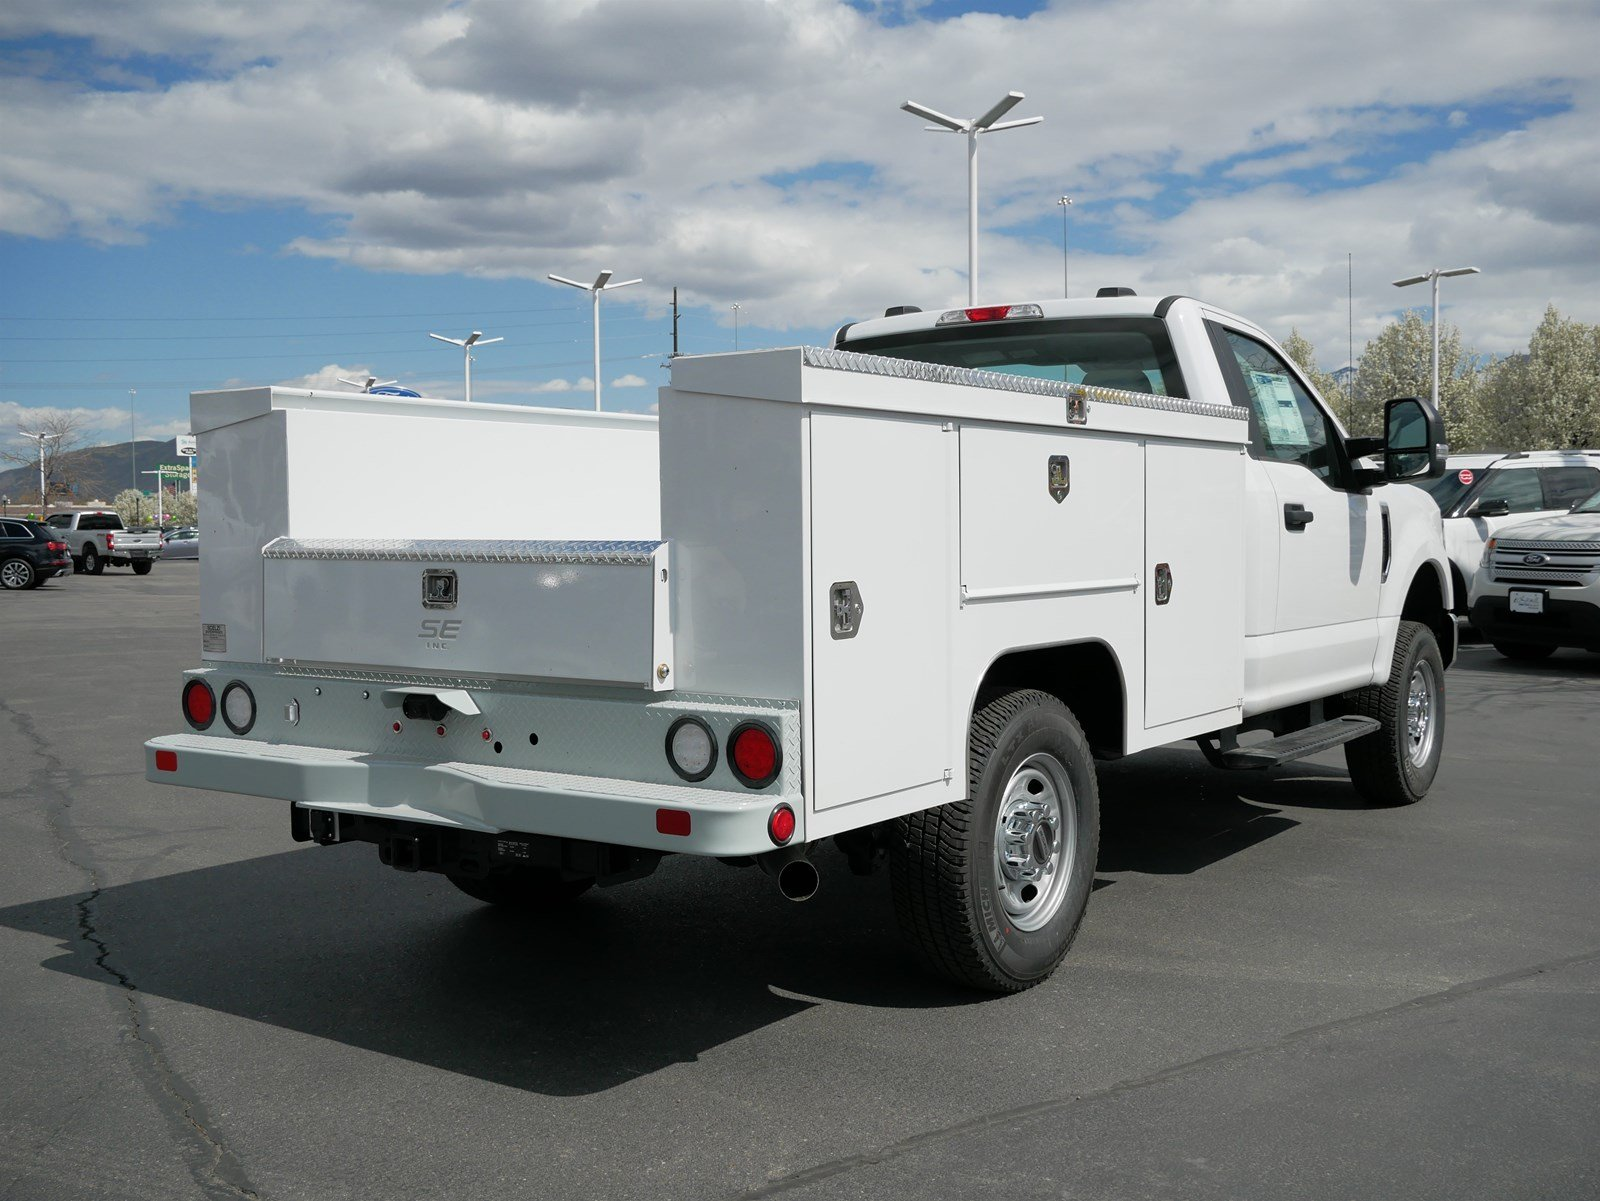 2020 Ford F-250 Regular Cab 4x4, Scelzi Service Body #63107 - photo 1